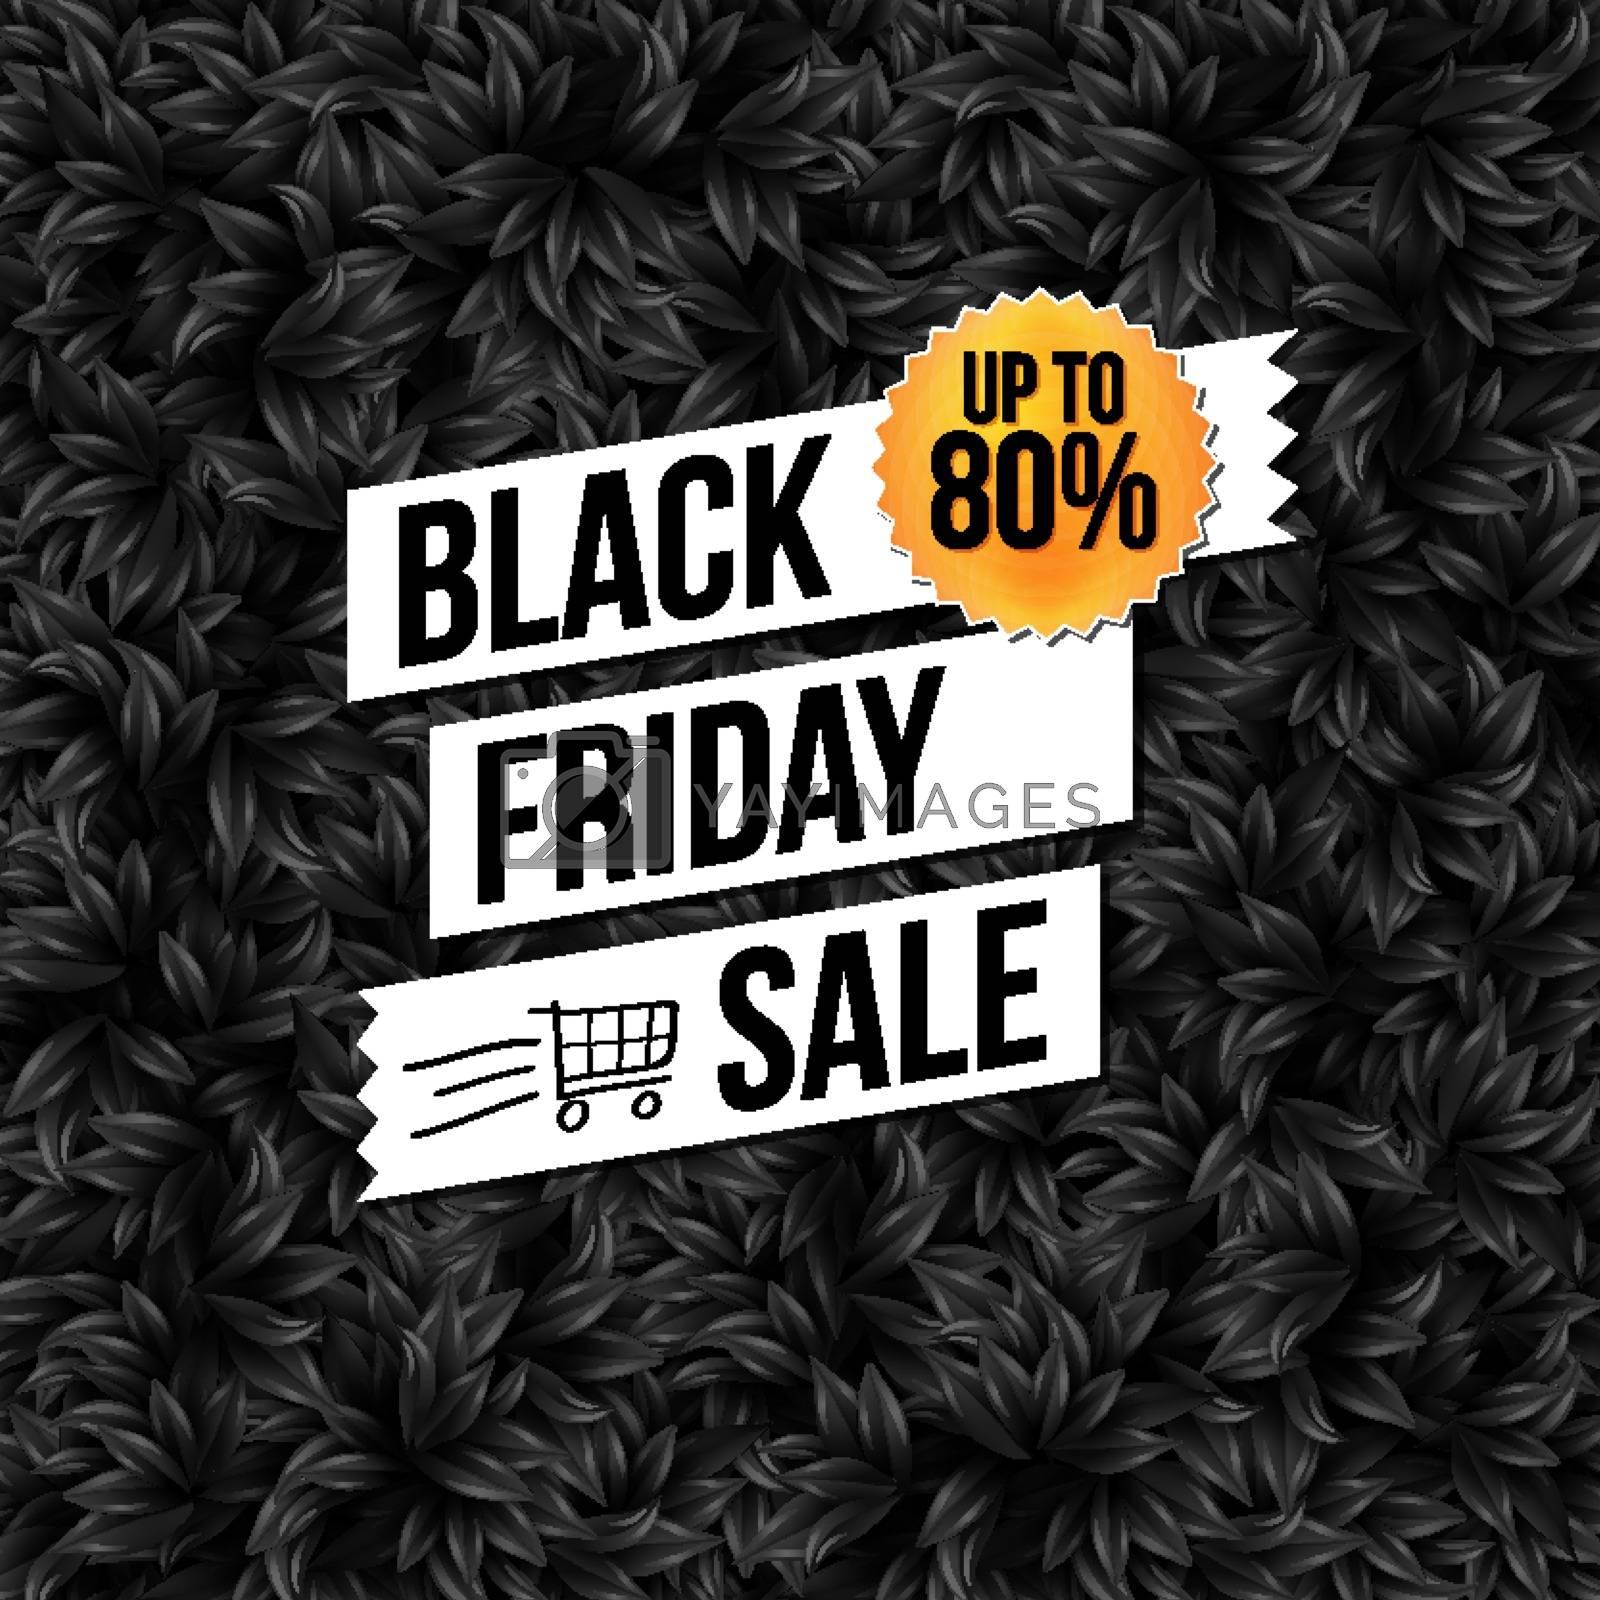 Black Friday sale business poster. Vector illustration.